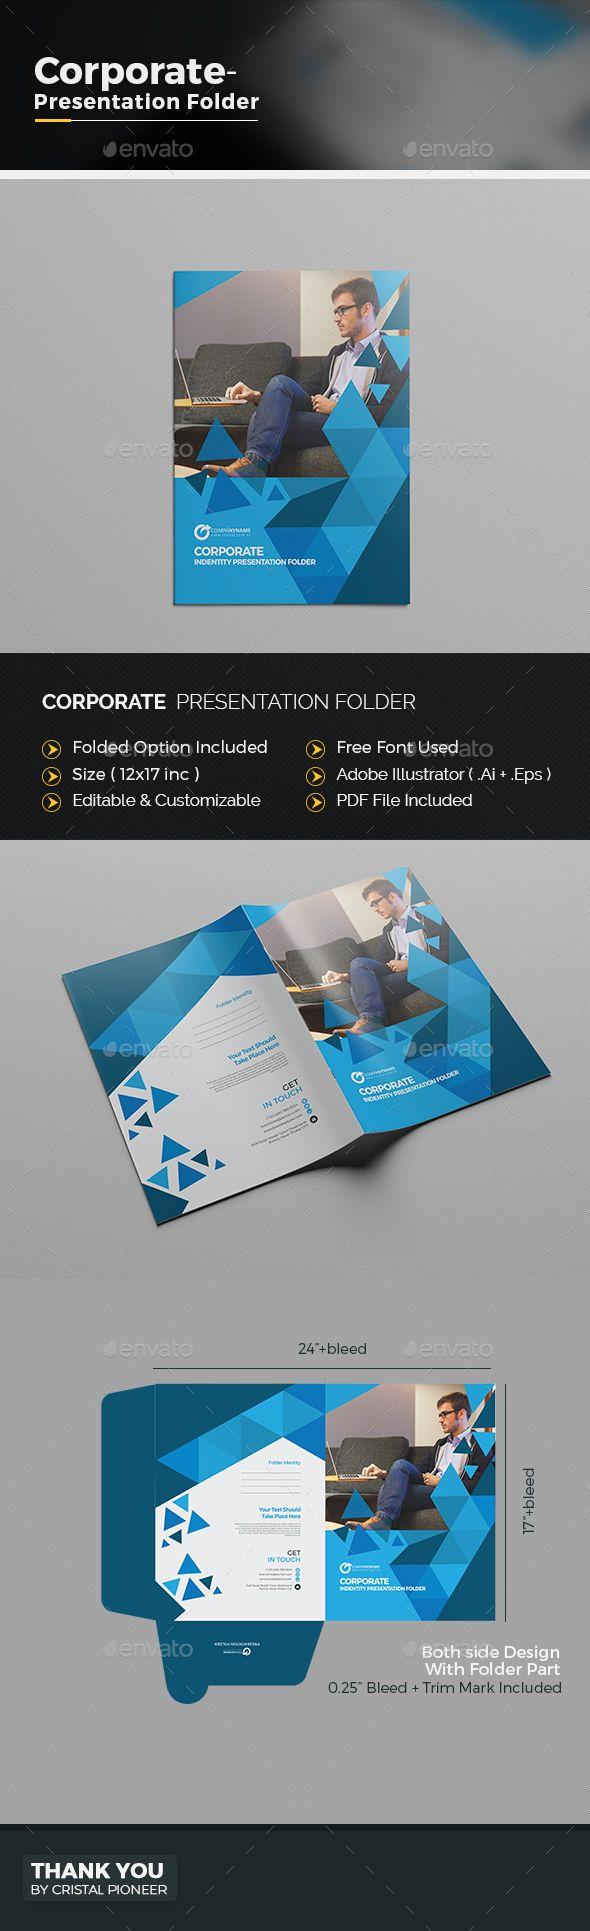 Abstract Presentation Folder | Pinterest | Carpeta